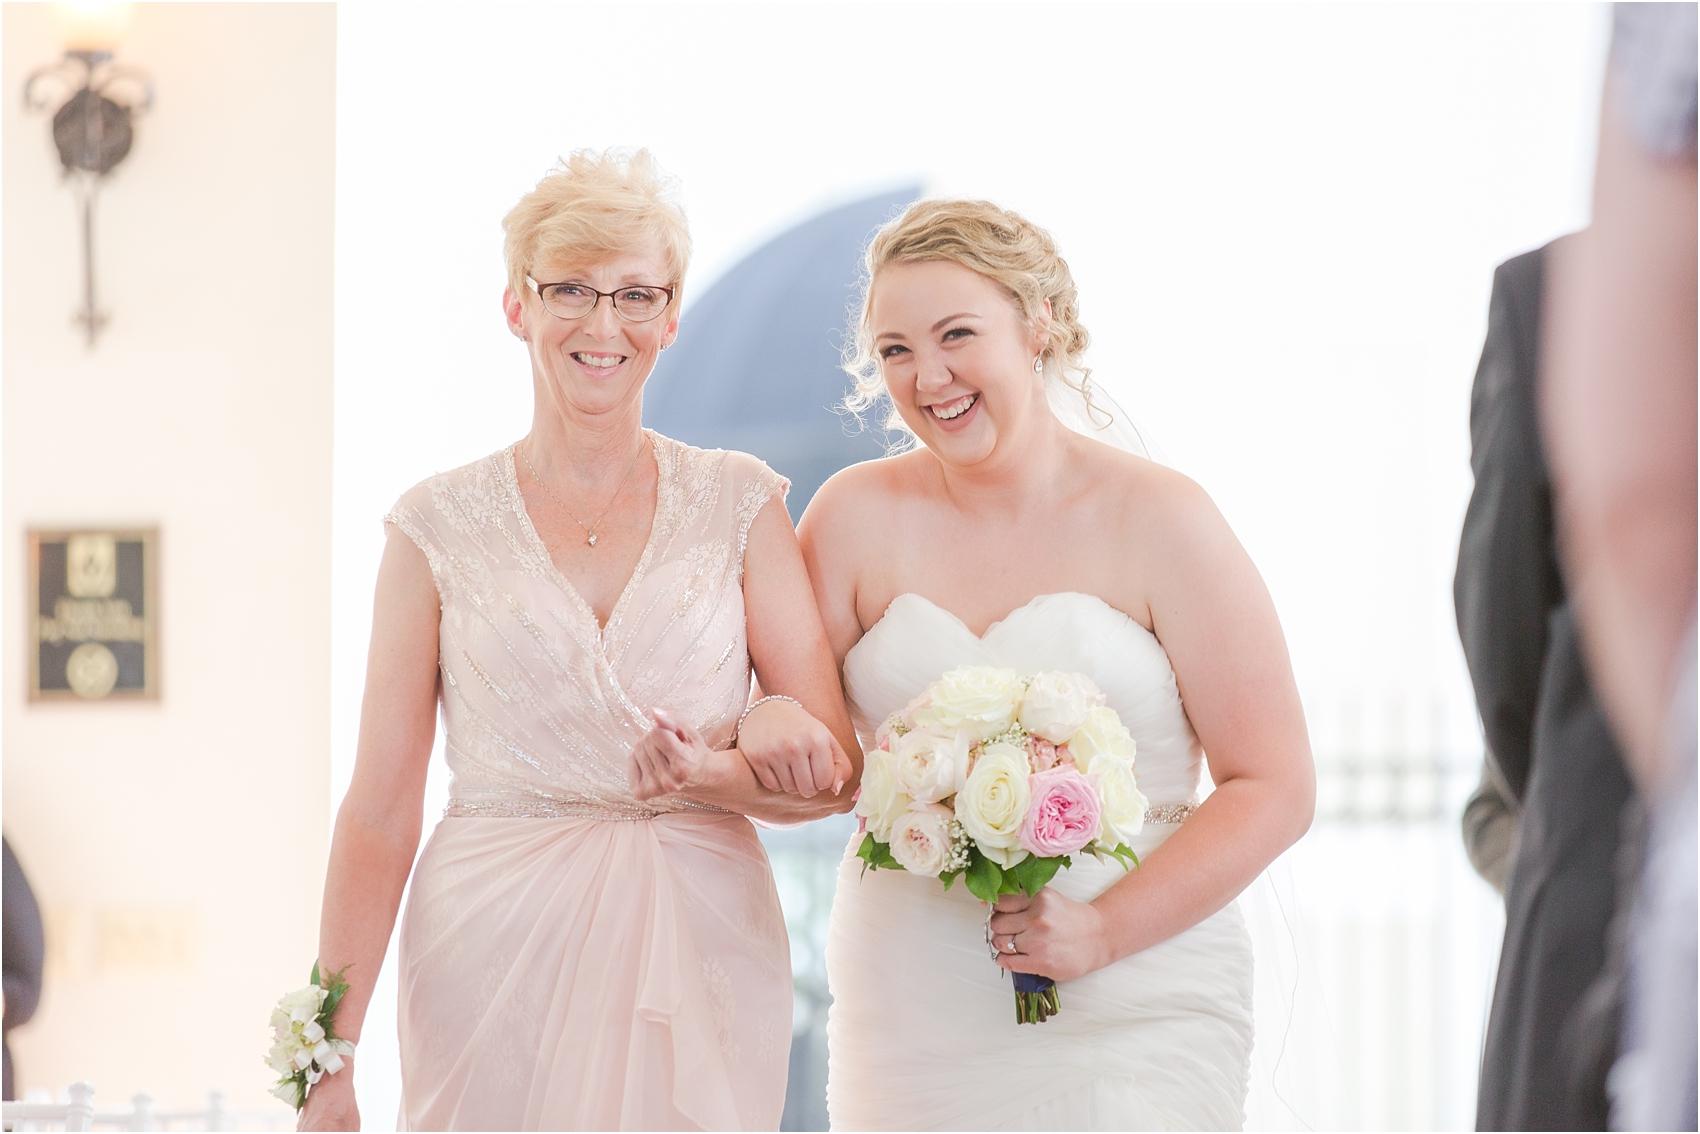 joyful-and-candid-navy-blush-wedding-photos-at-crystal-gardens-in-howell-mi-by-courtney-carolyn-photography_0031.jpg